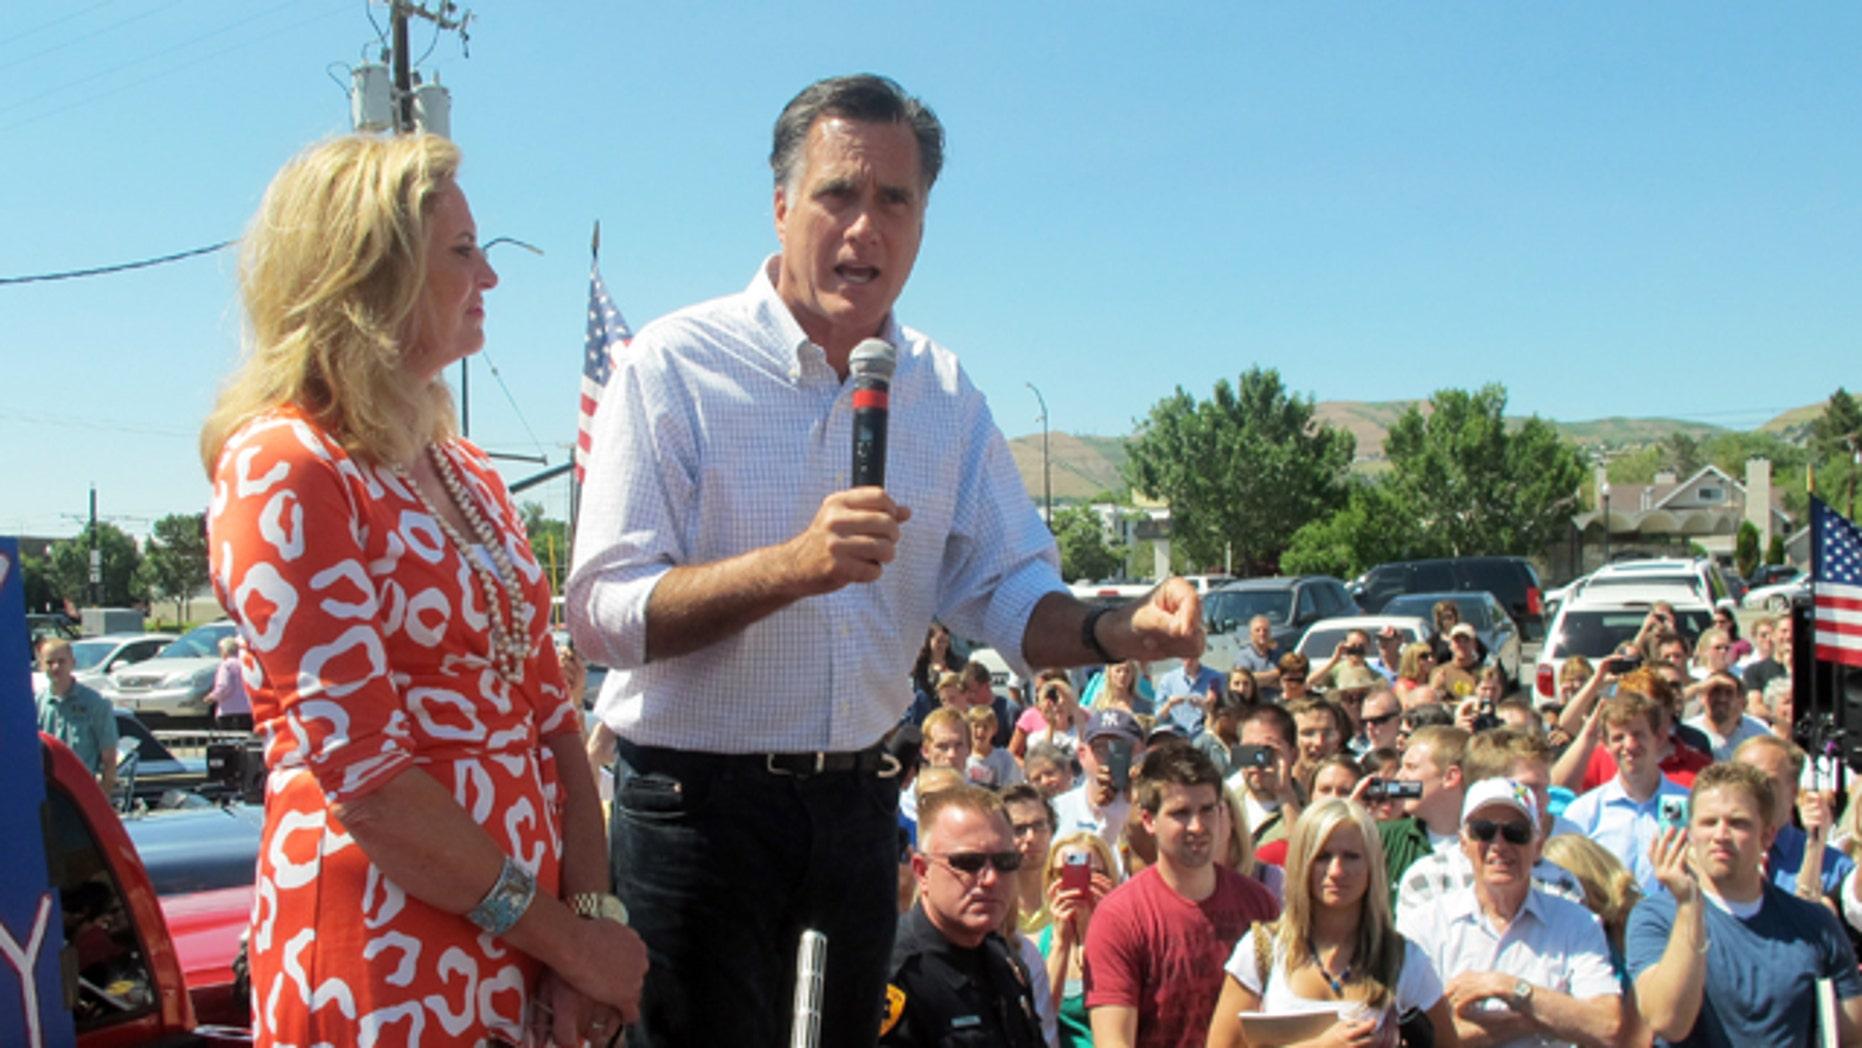 June 24: Former Massachusetts Gov. Mitt Romney and his wife, Ann, greet supporters at a drive-in hamburger restaurant in Salt Lake City.